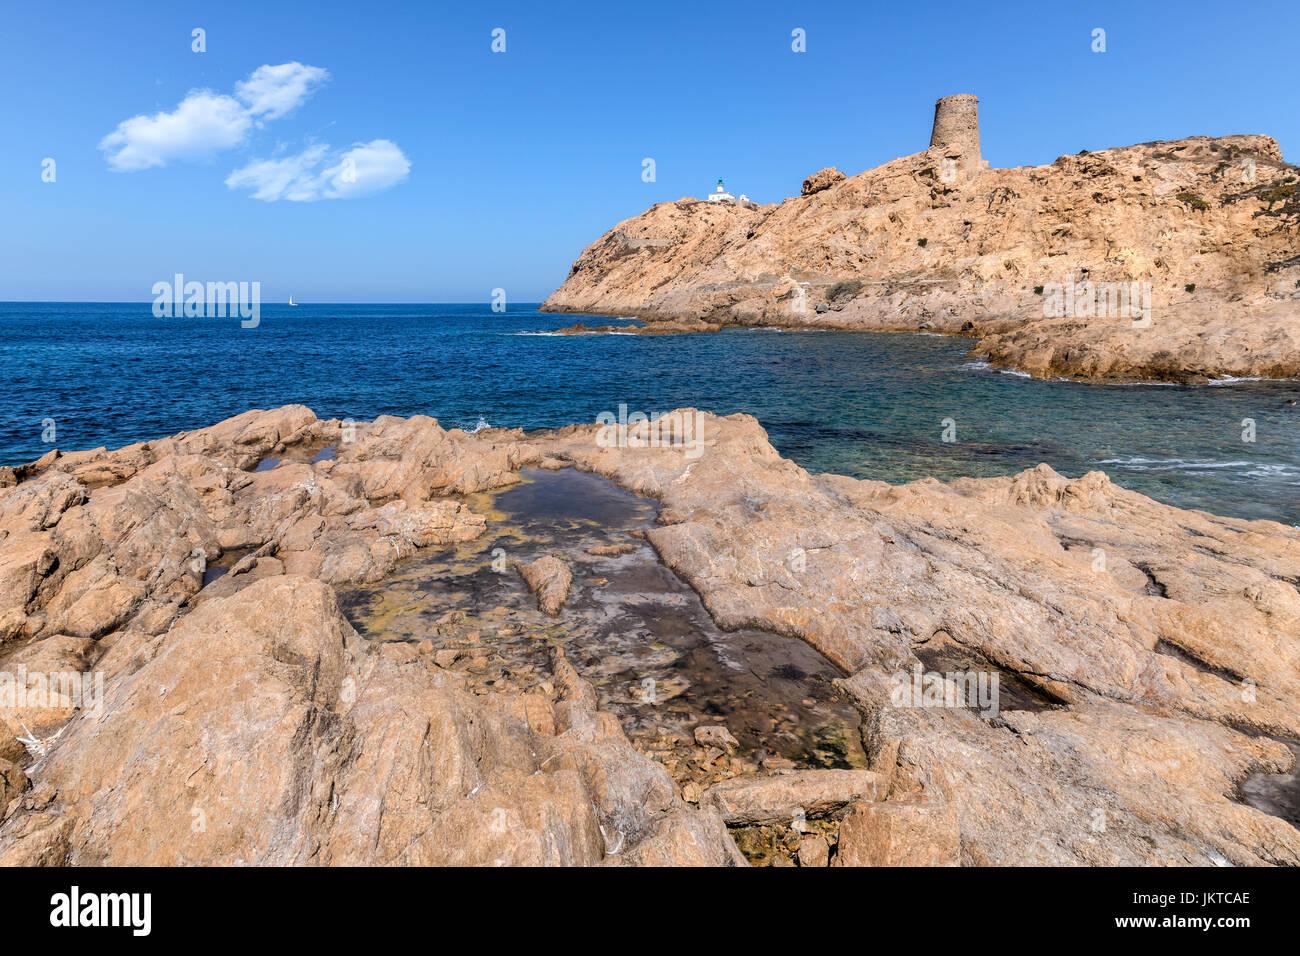 L'ile Rousse, Balagne, Corsica, France - Stock Image